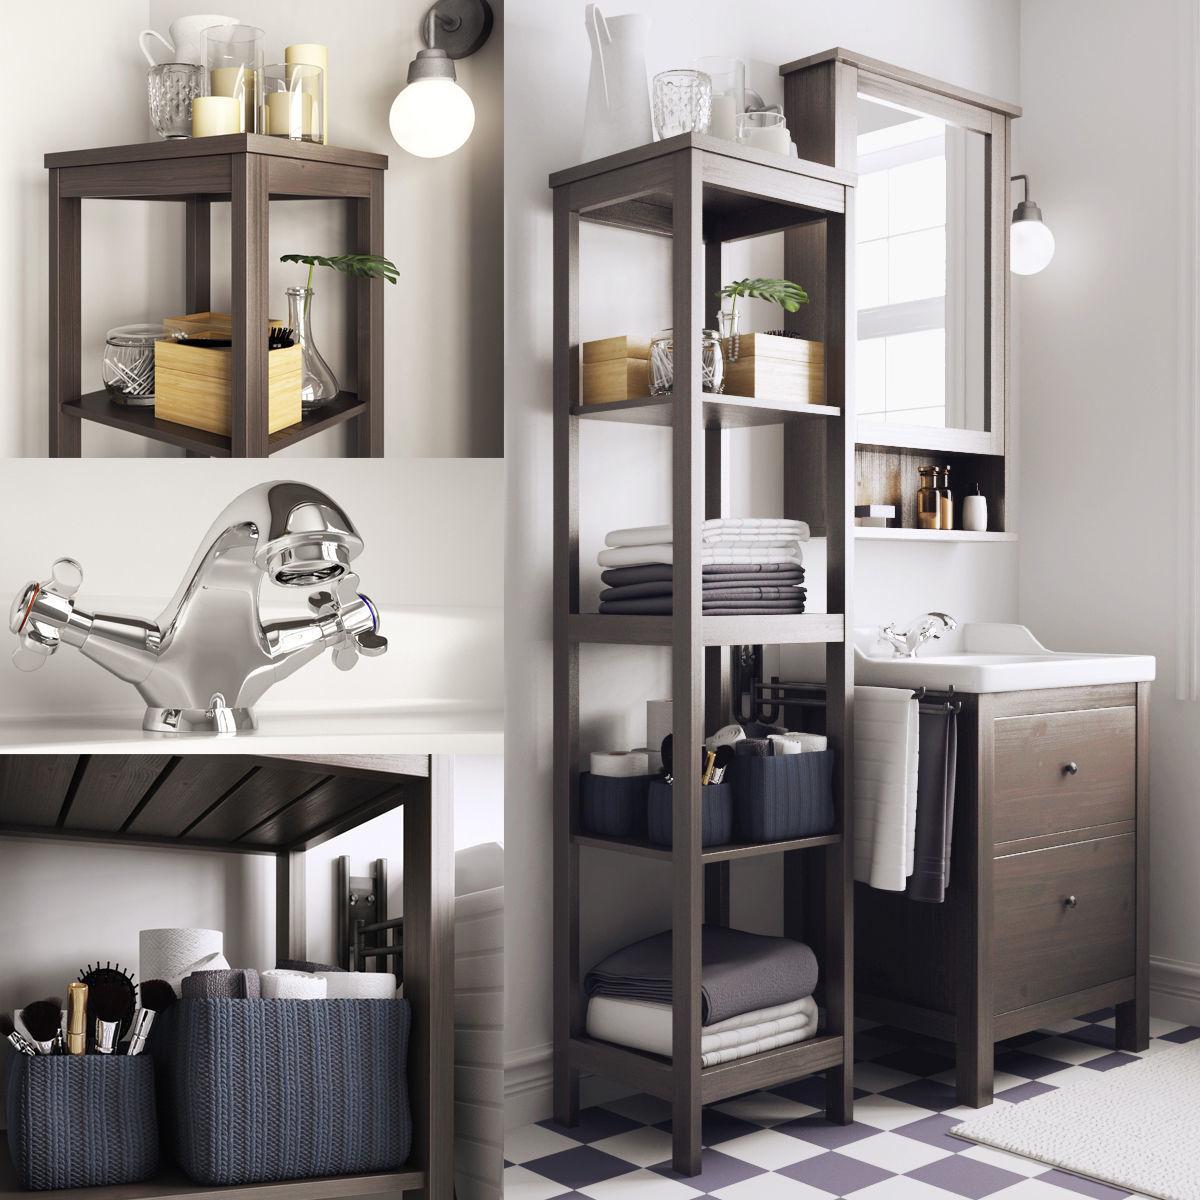 Bathroom I Hemnes Rttviken